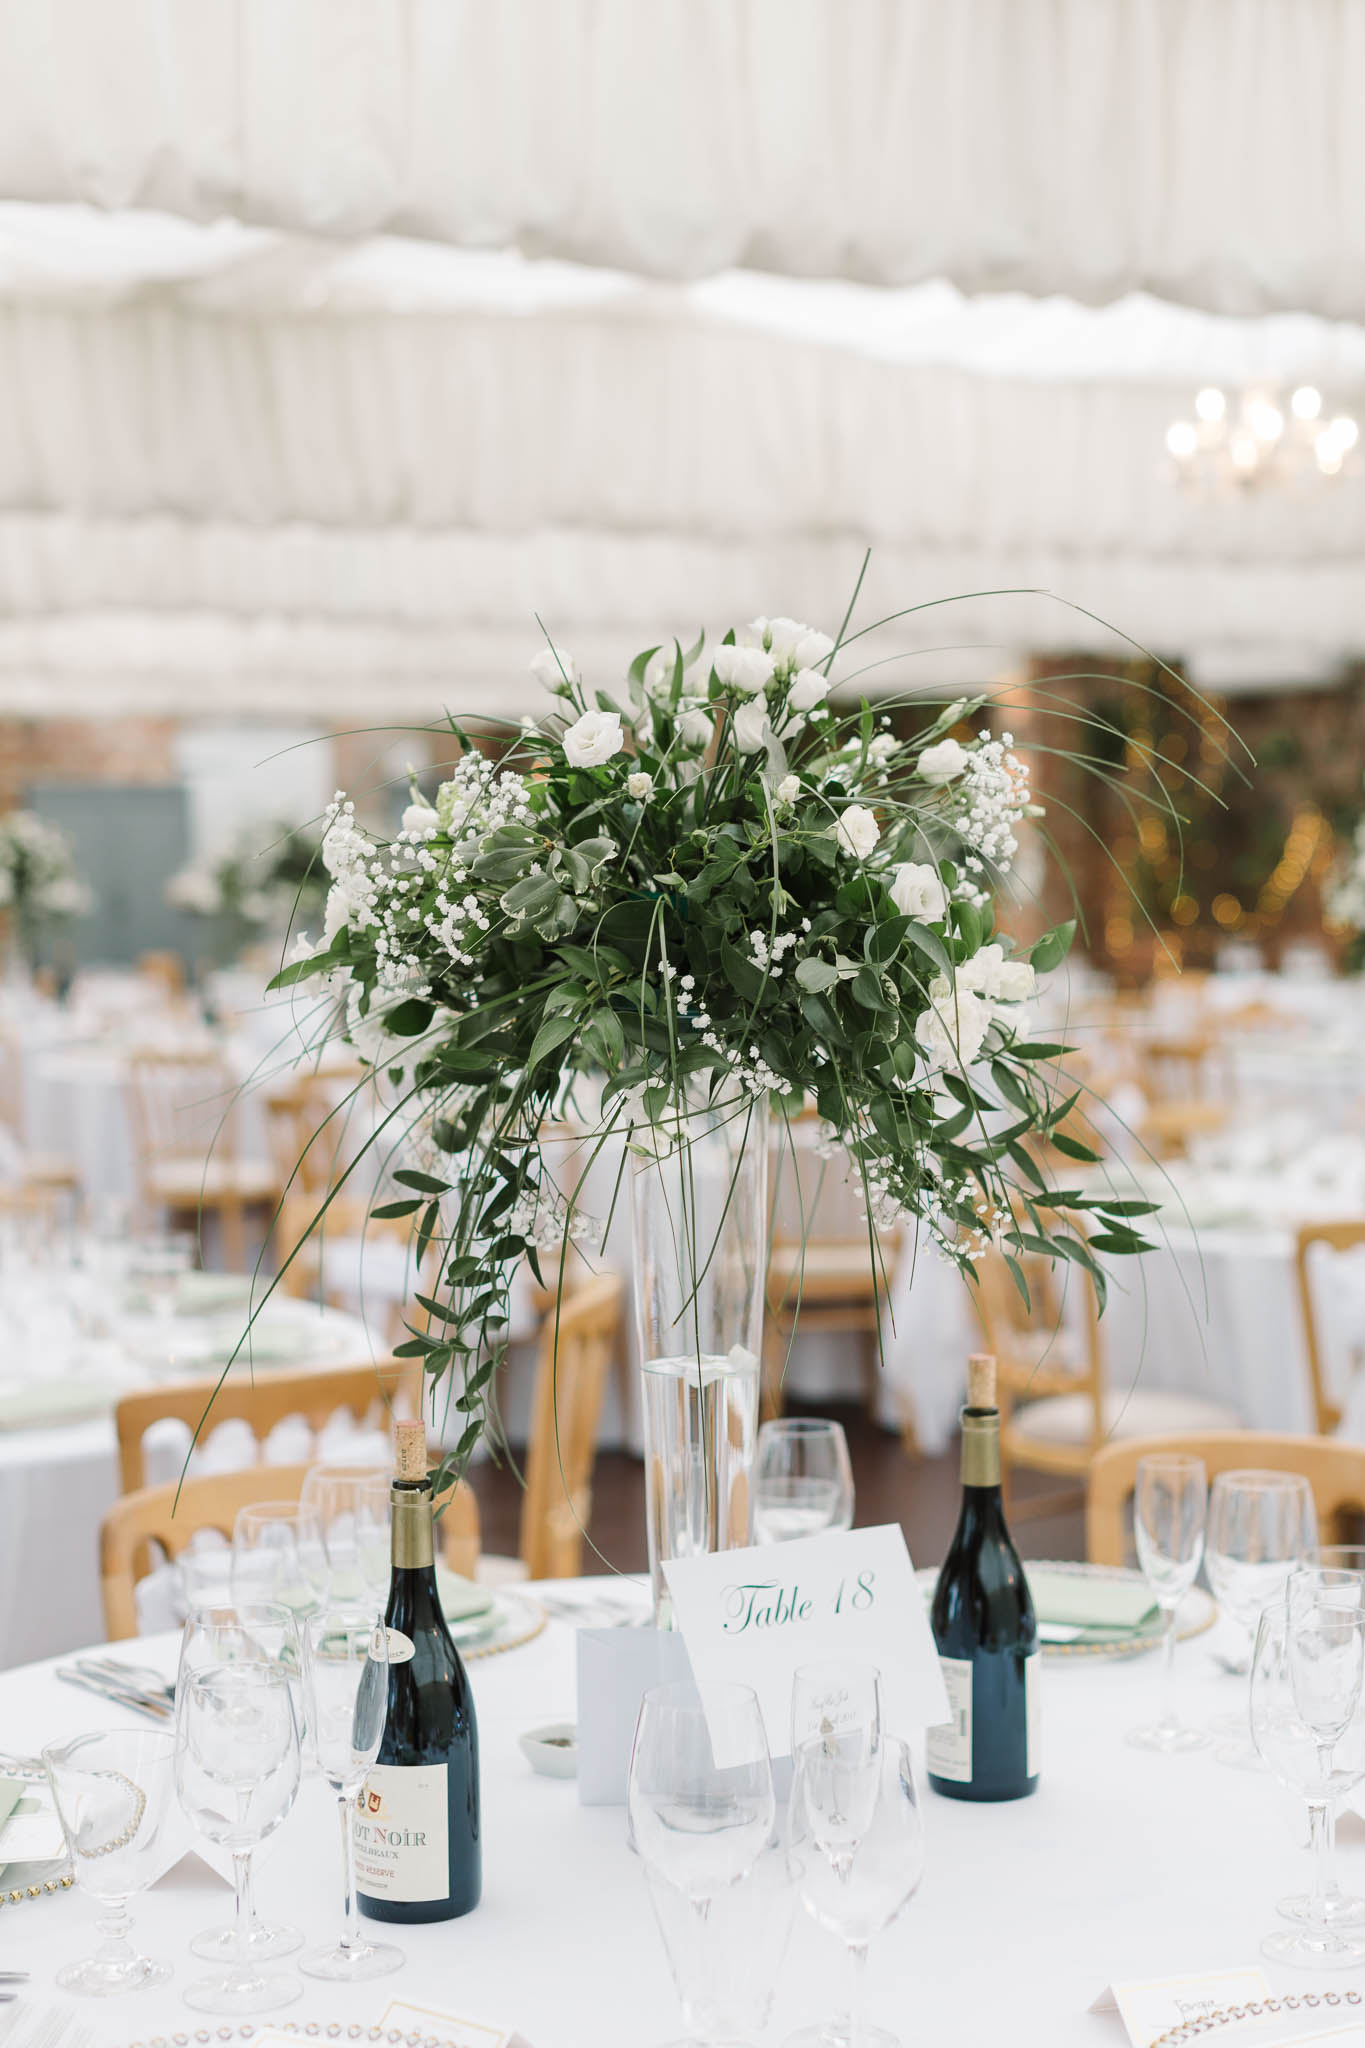 greenery and white flowers table decor for wedding - elegant and stylish wedding